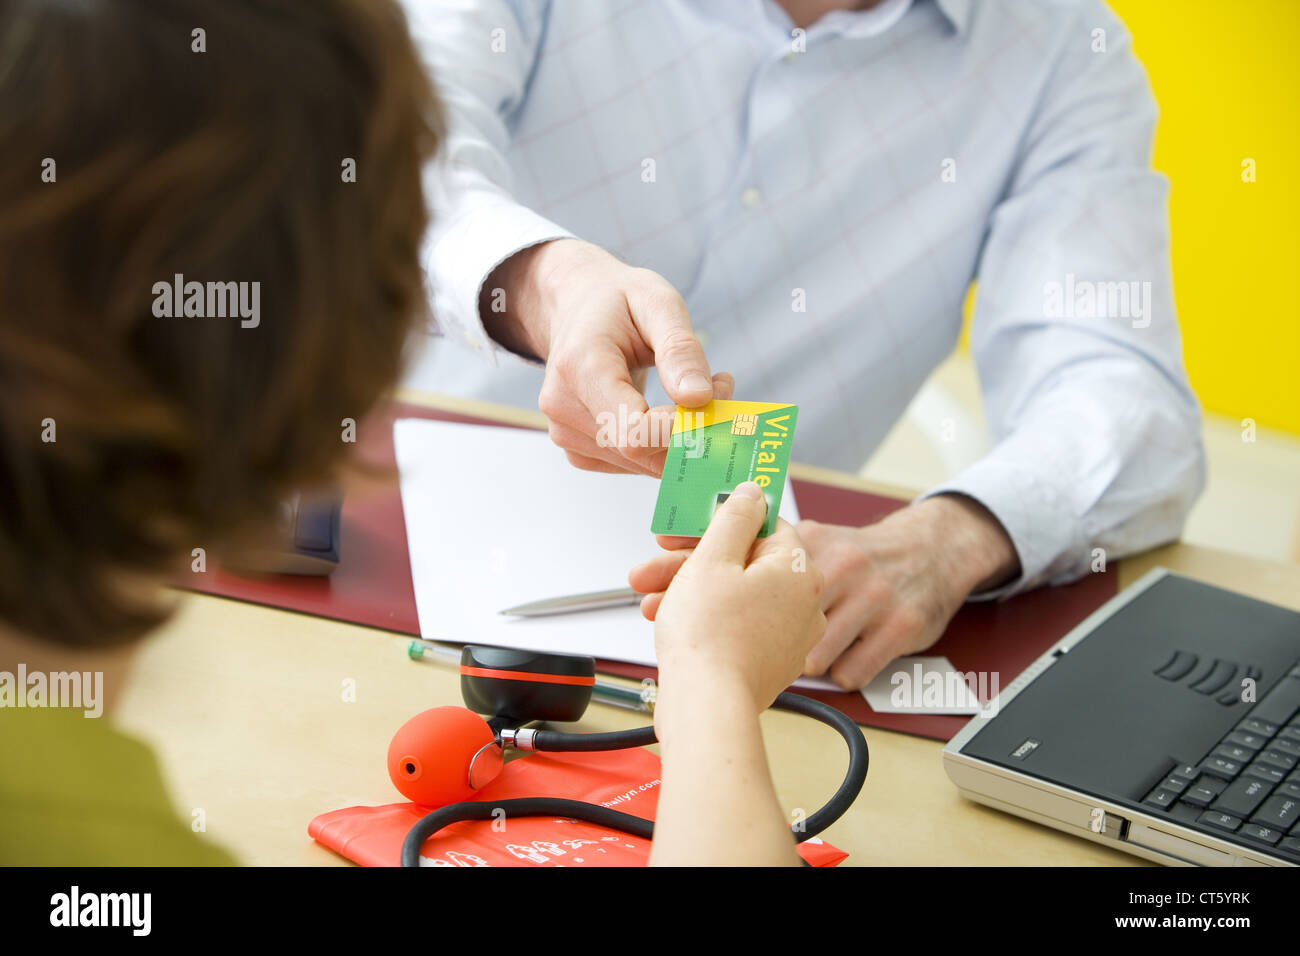 NAT'L HEALTH SERVICE CARD - Stock Image